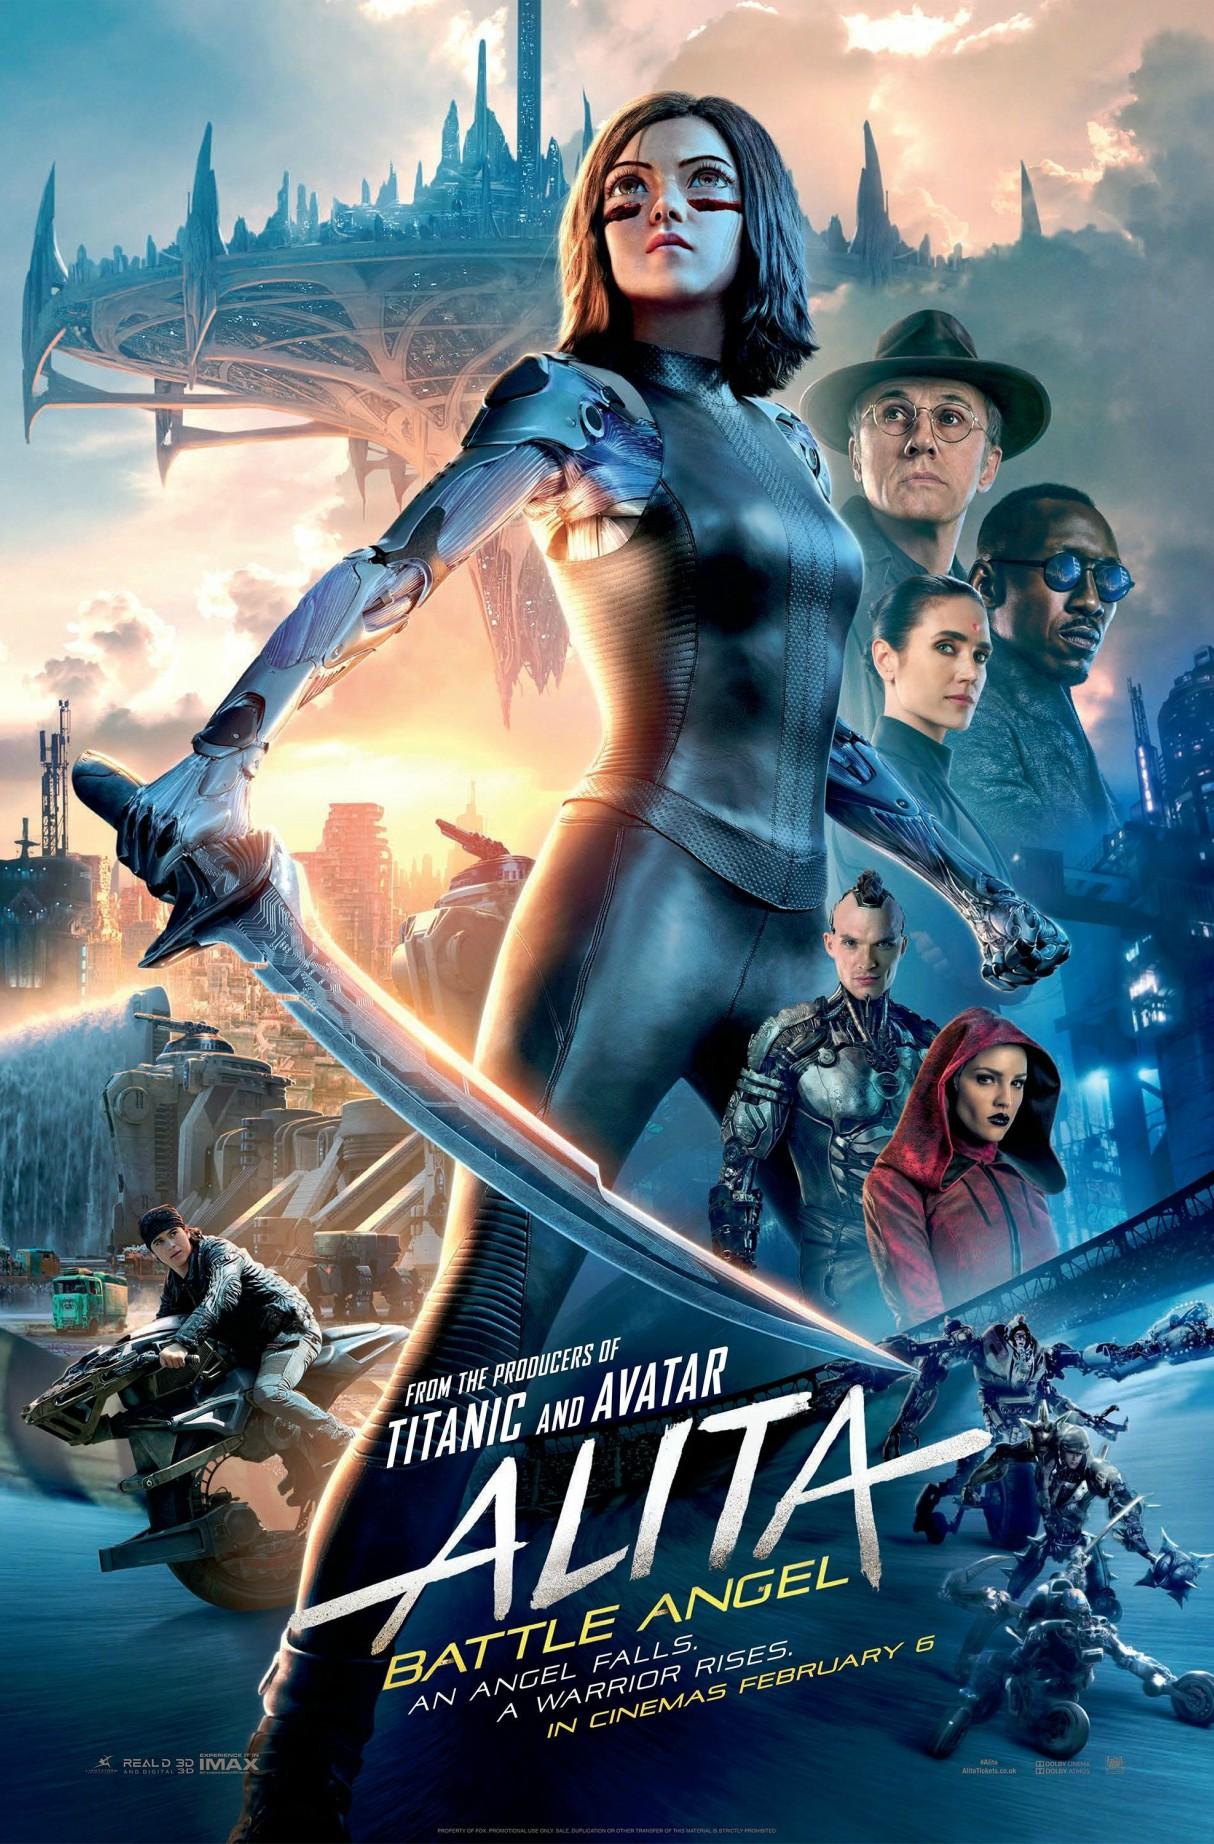 alita-battle-angel-film-movie-review-poster